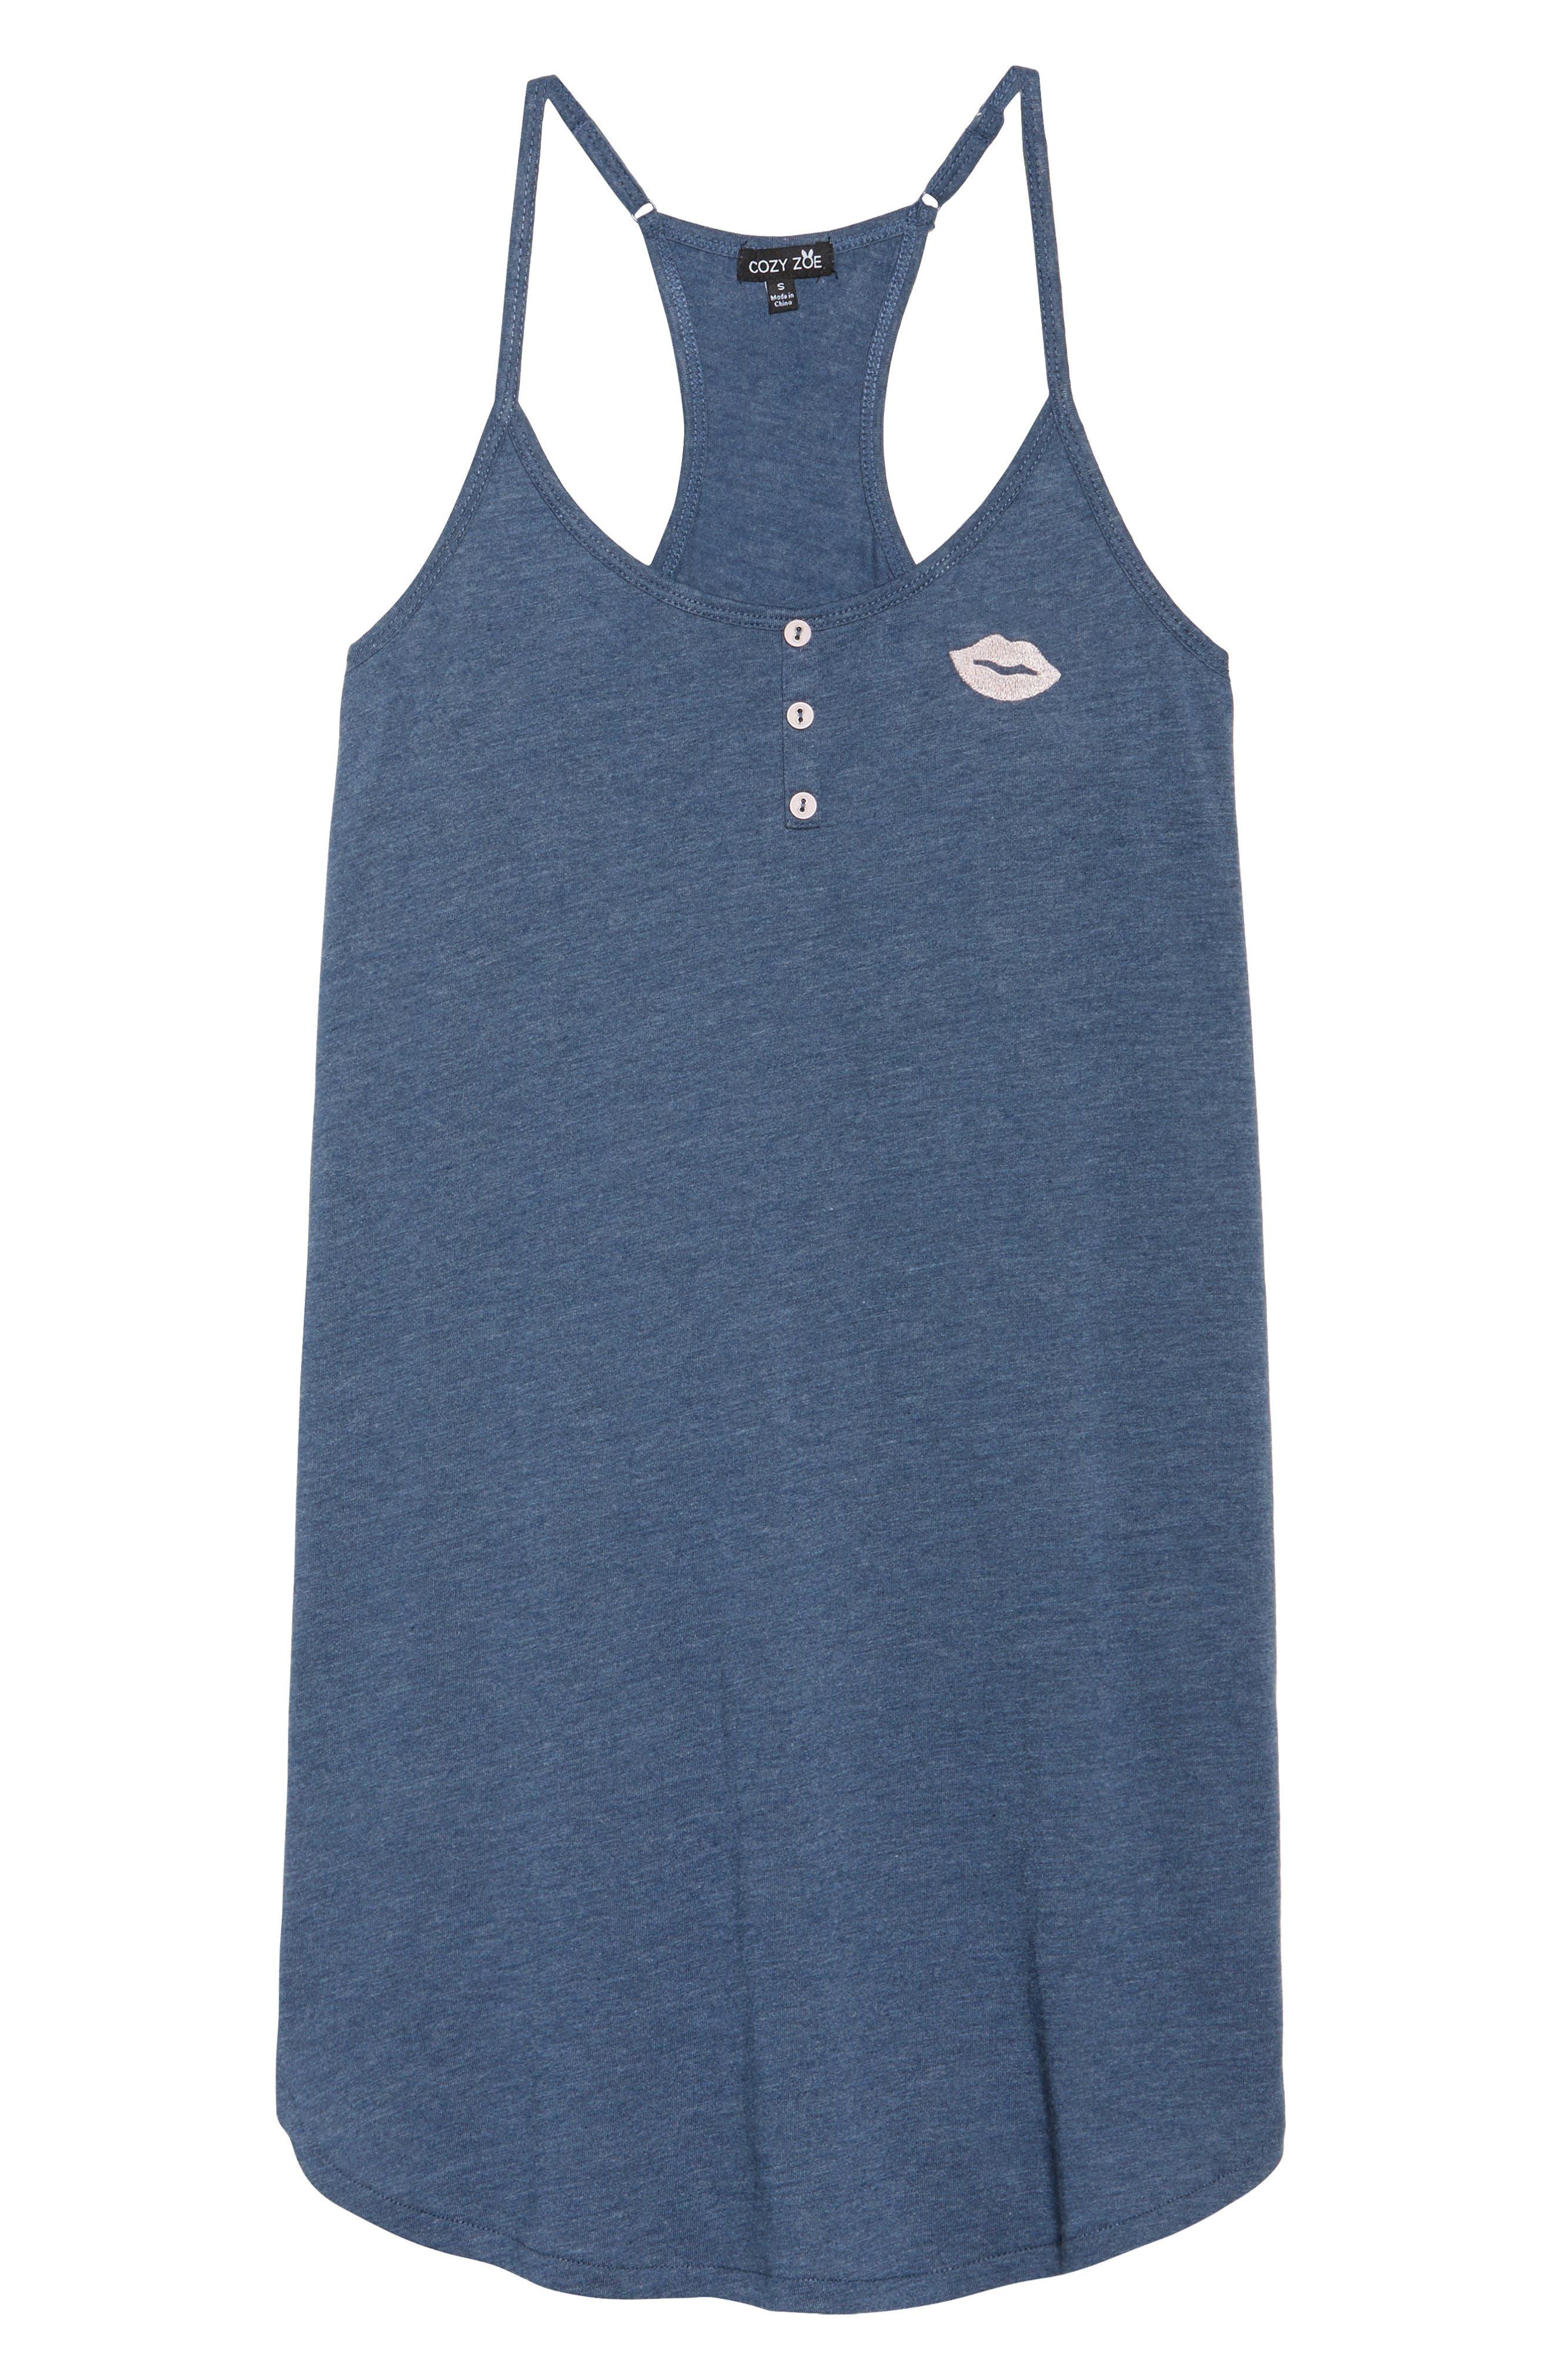 Jersey Chemise,                             Alternate thumbnail 6, color,                             Blue Melange